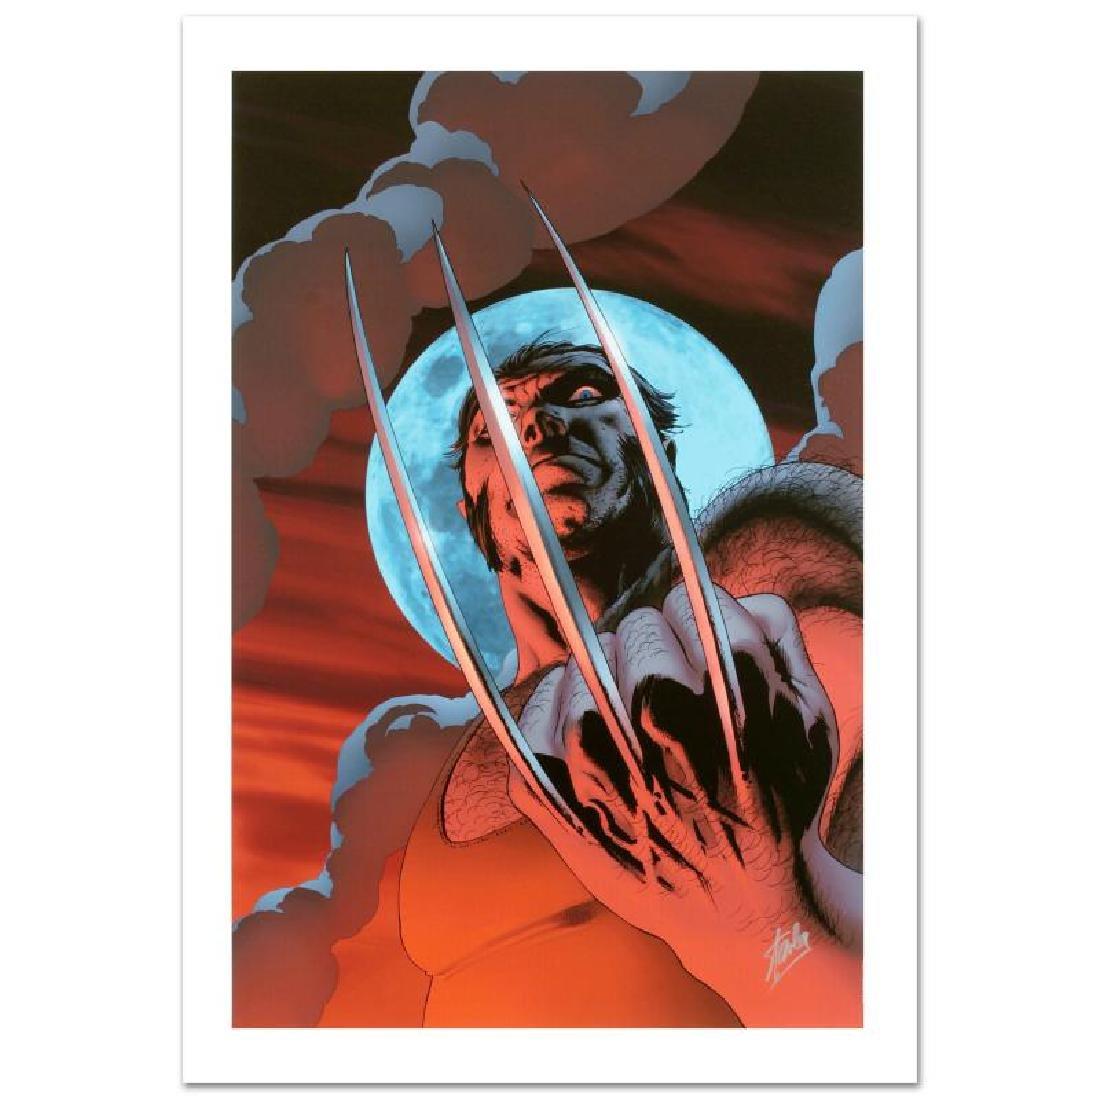 Astonishing X-Men #8 by Stan Lee - Marvel Comics